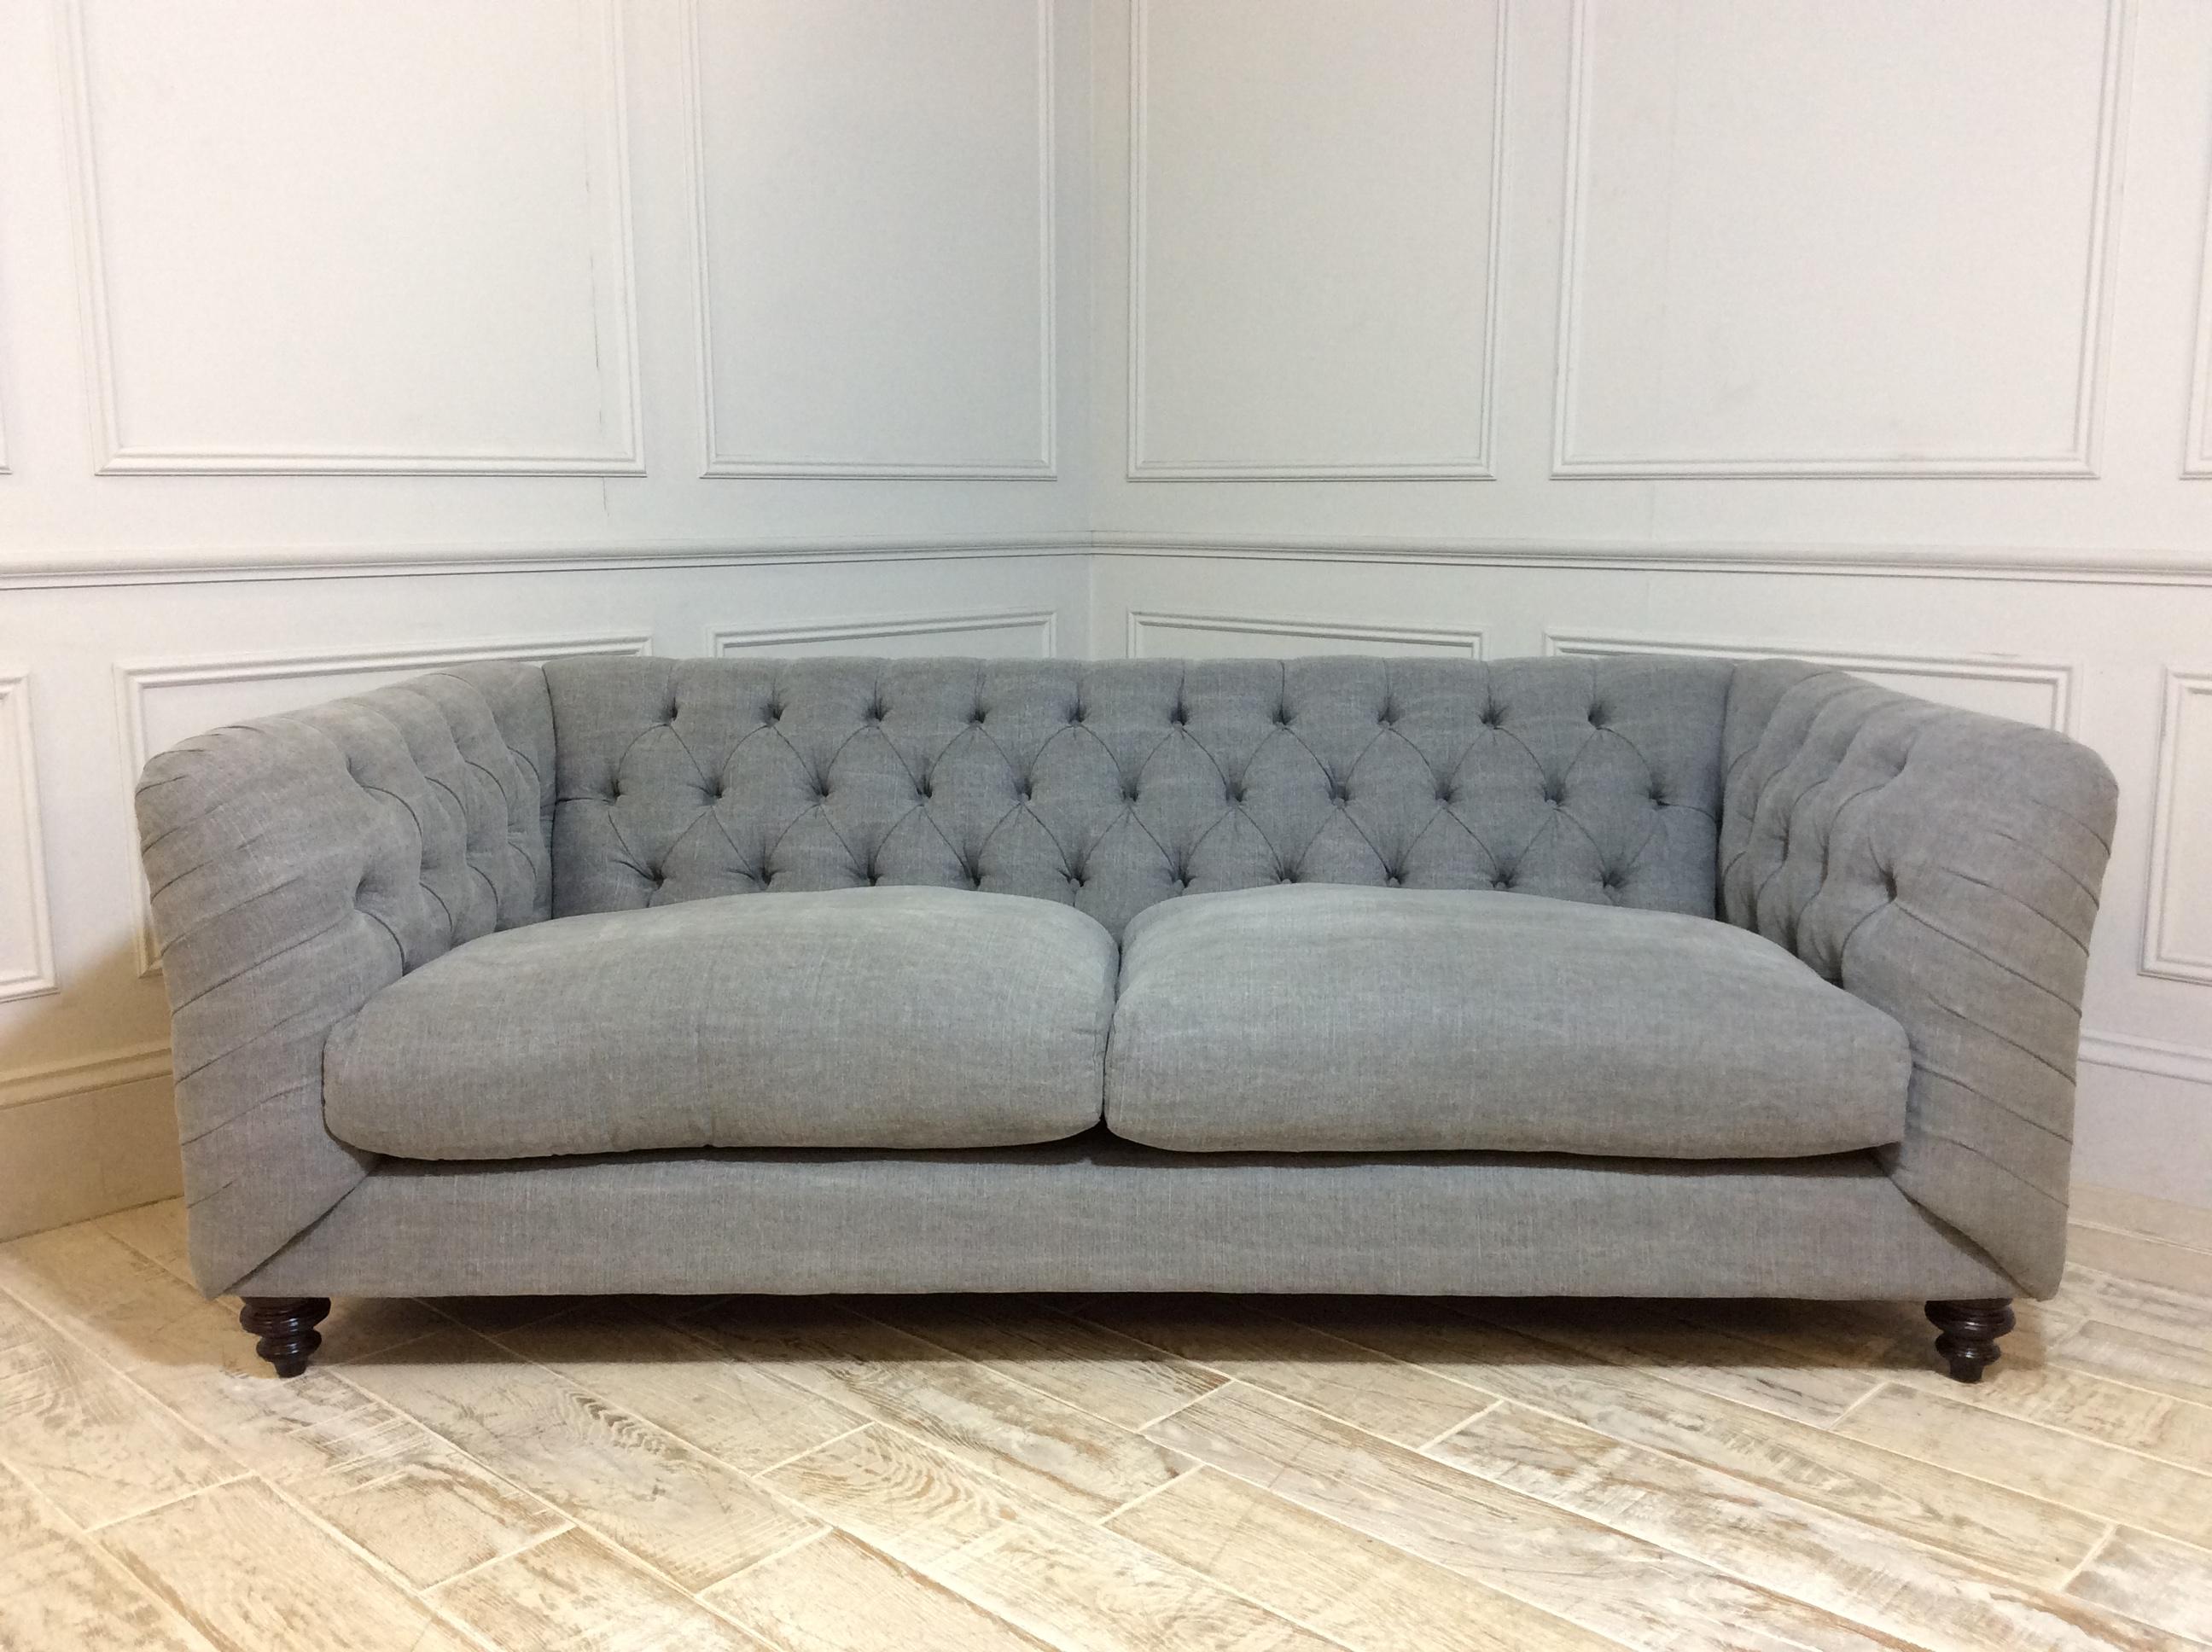 Dulwich Midi Fabric Sofa in Linen Mix Pigeon